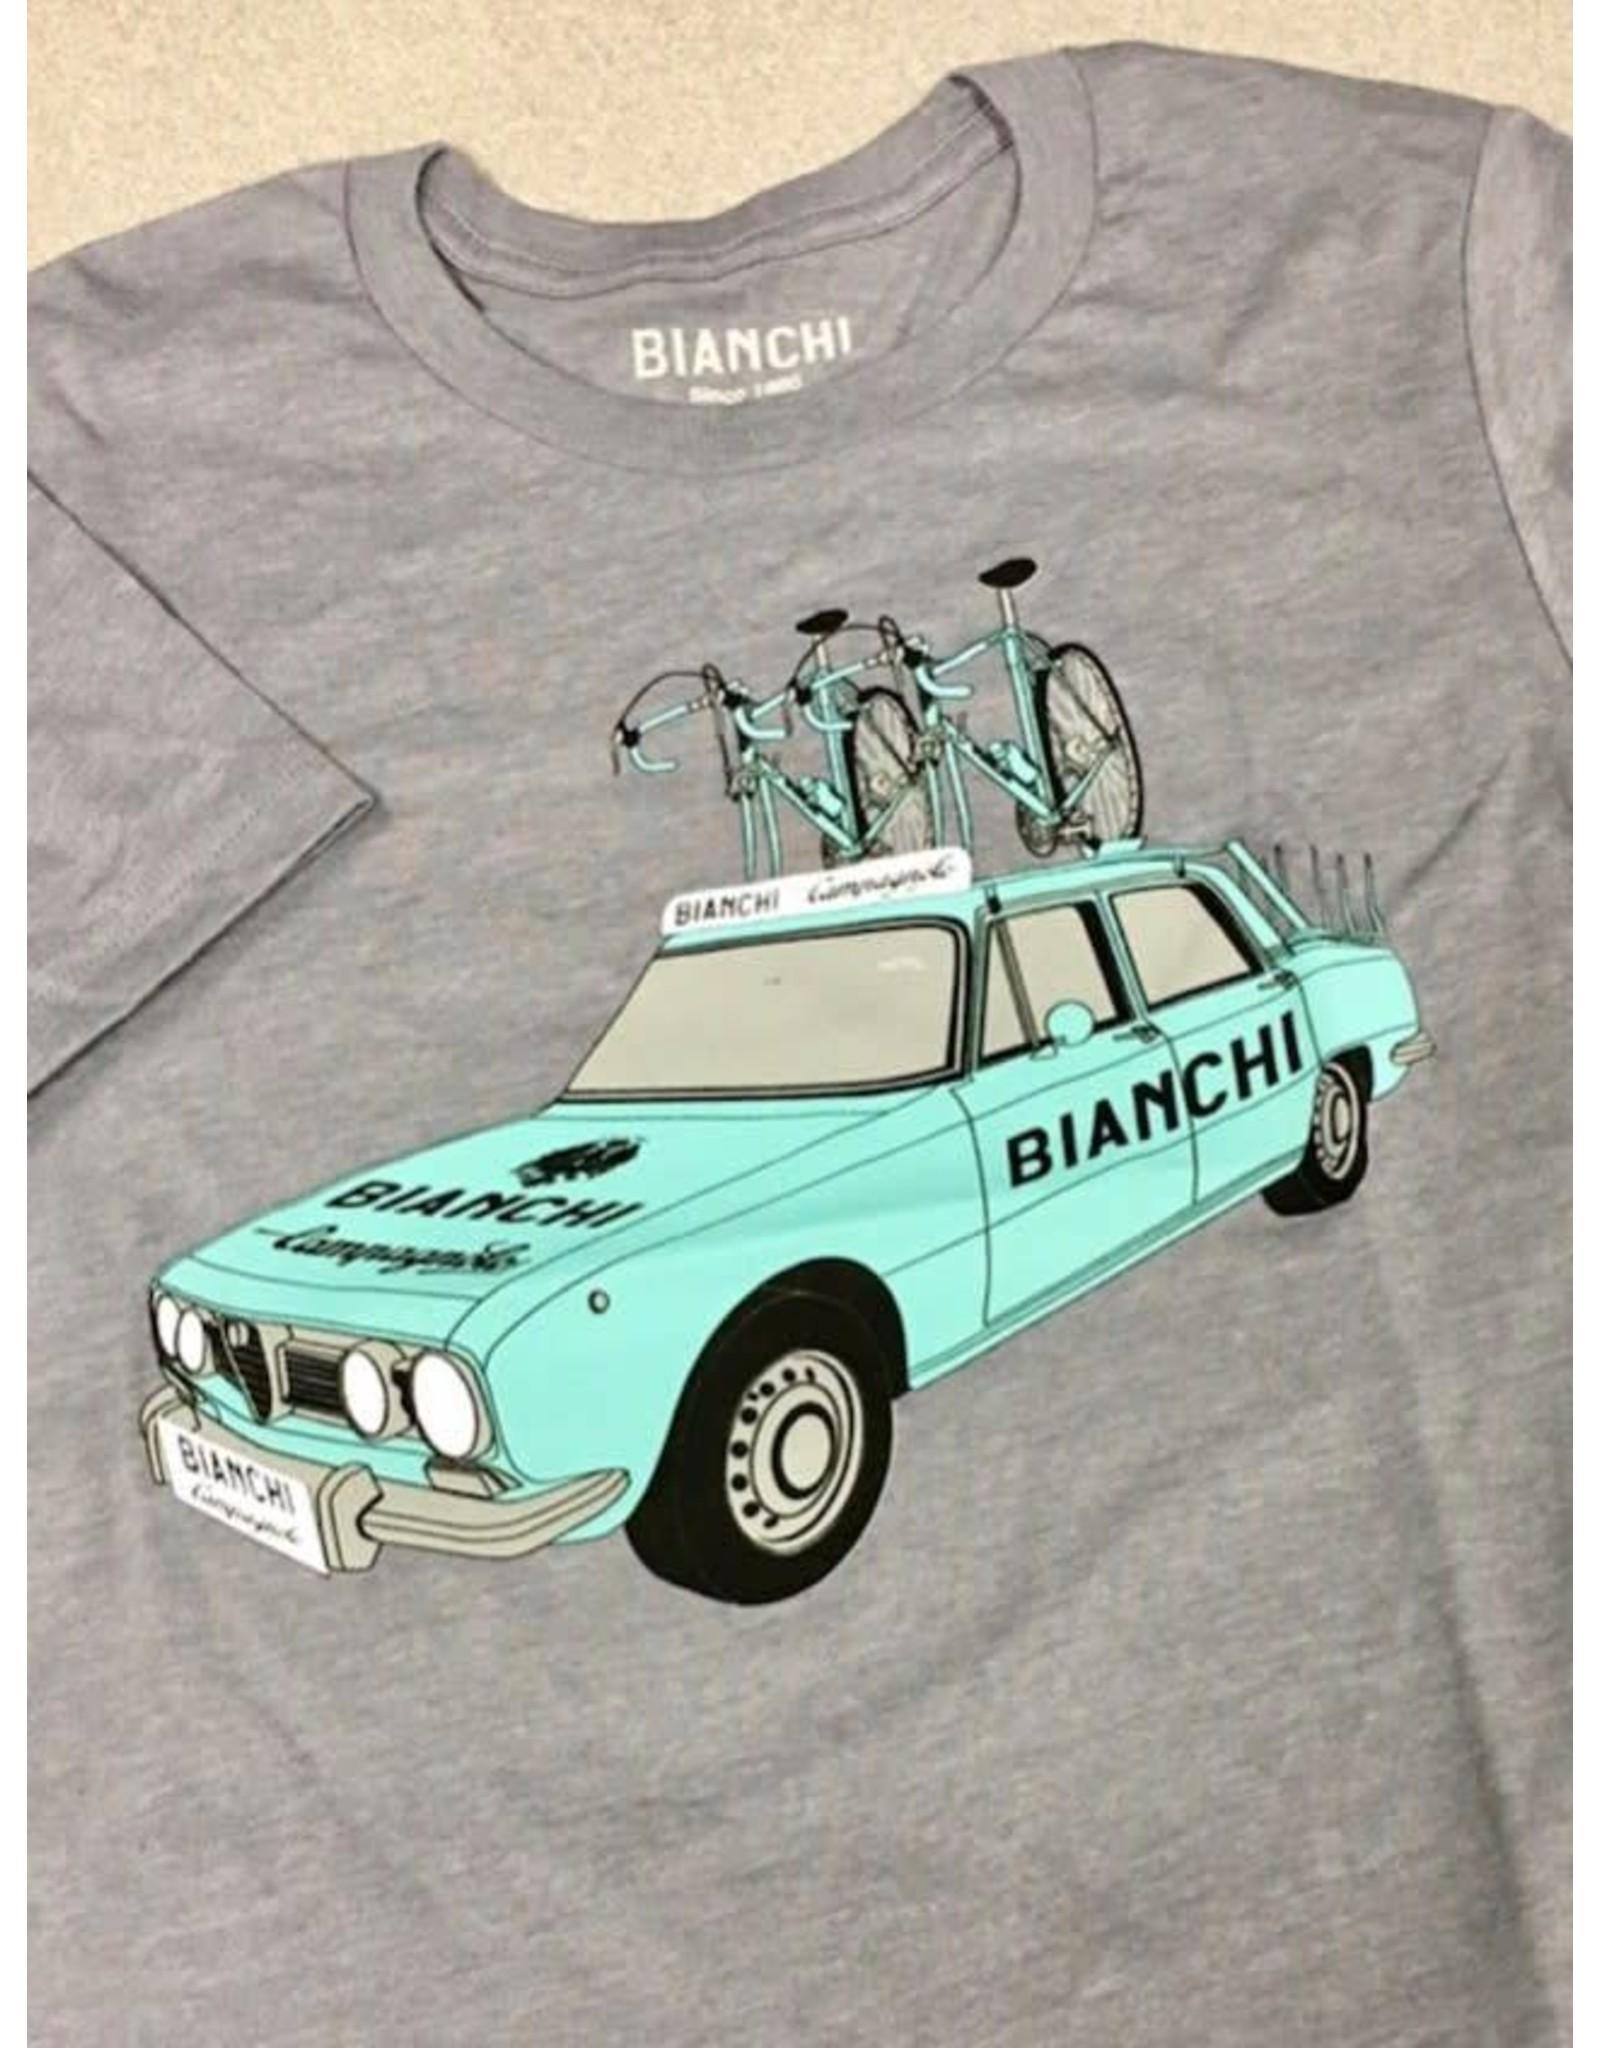 Bianchi Bianchi Alfa Romeo Vintage T